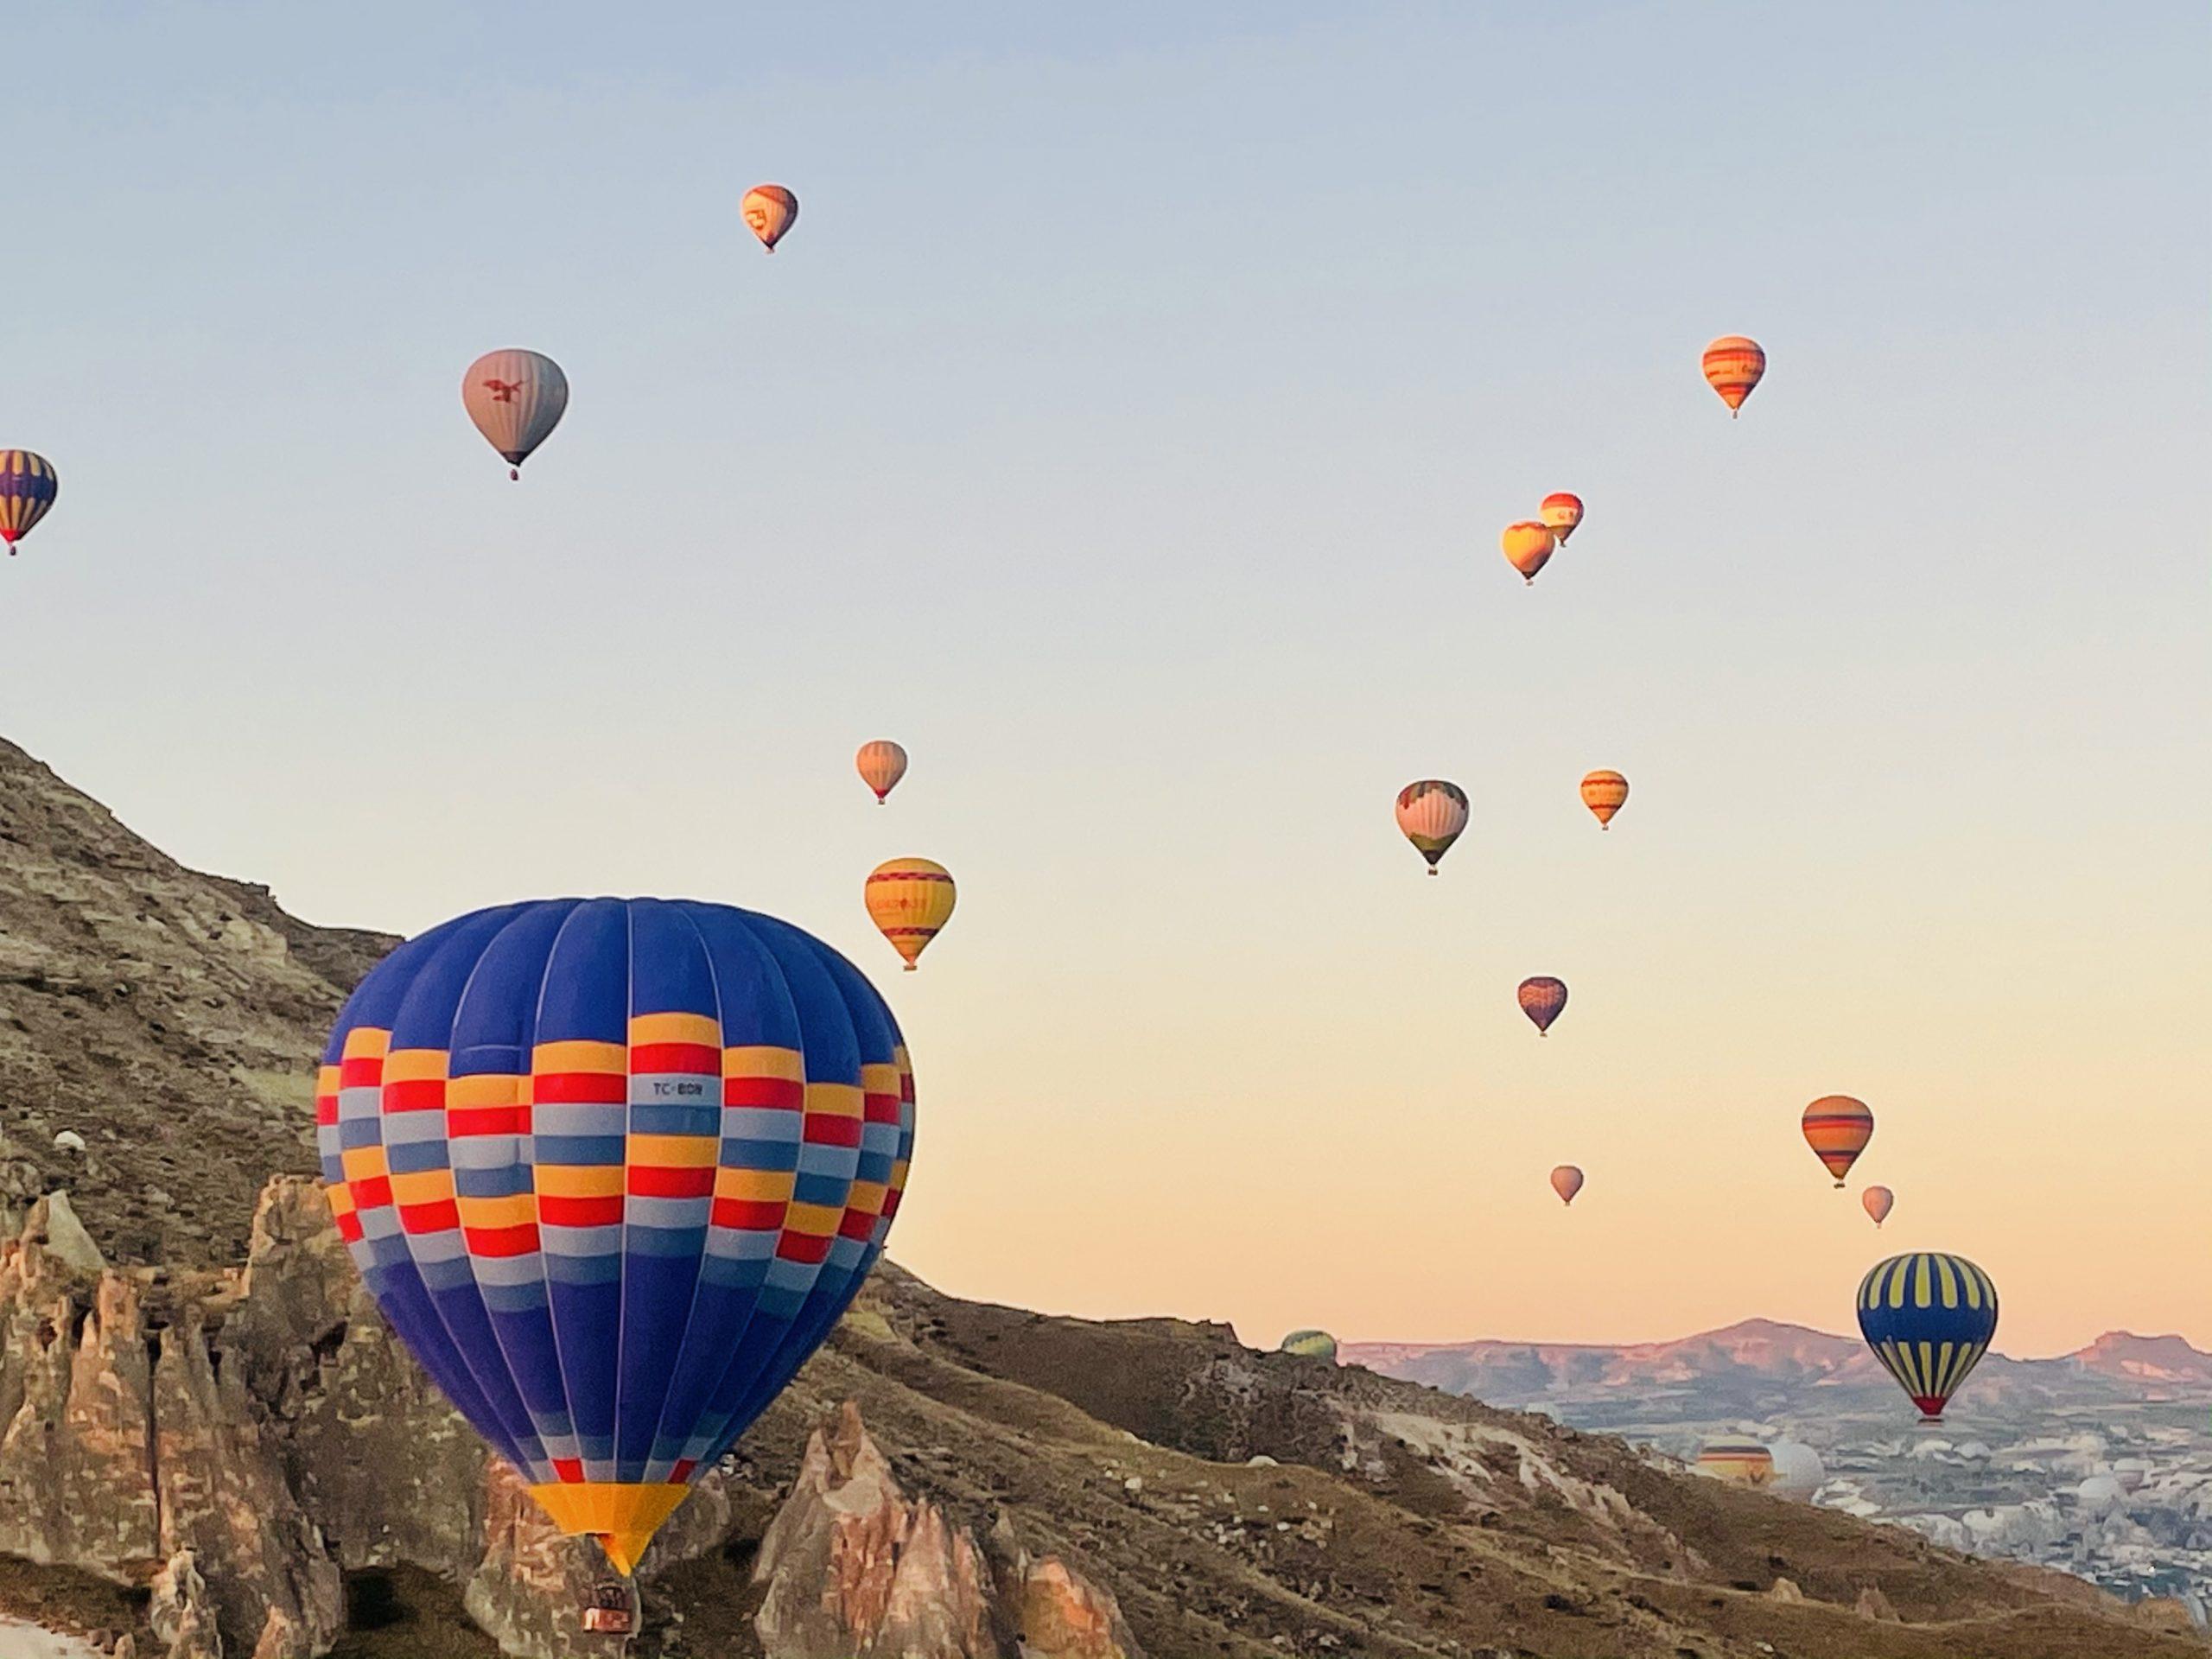 Cappadocia, Turkey Hot Air Balloon Ride